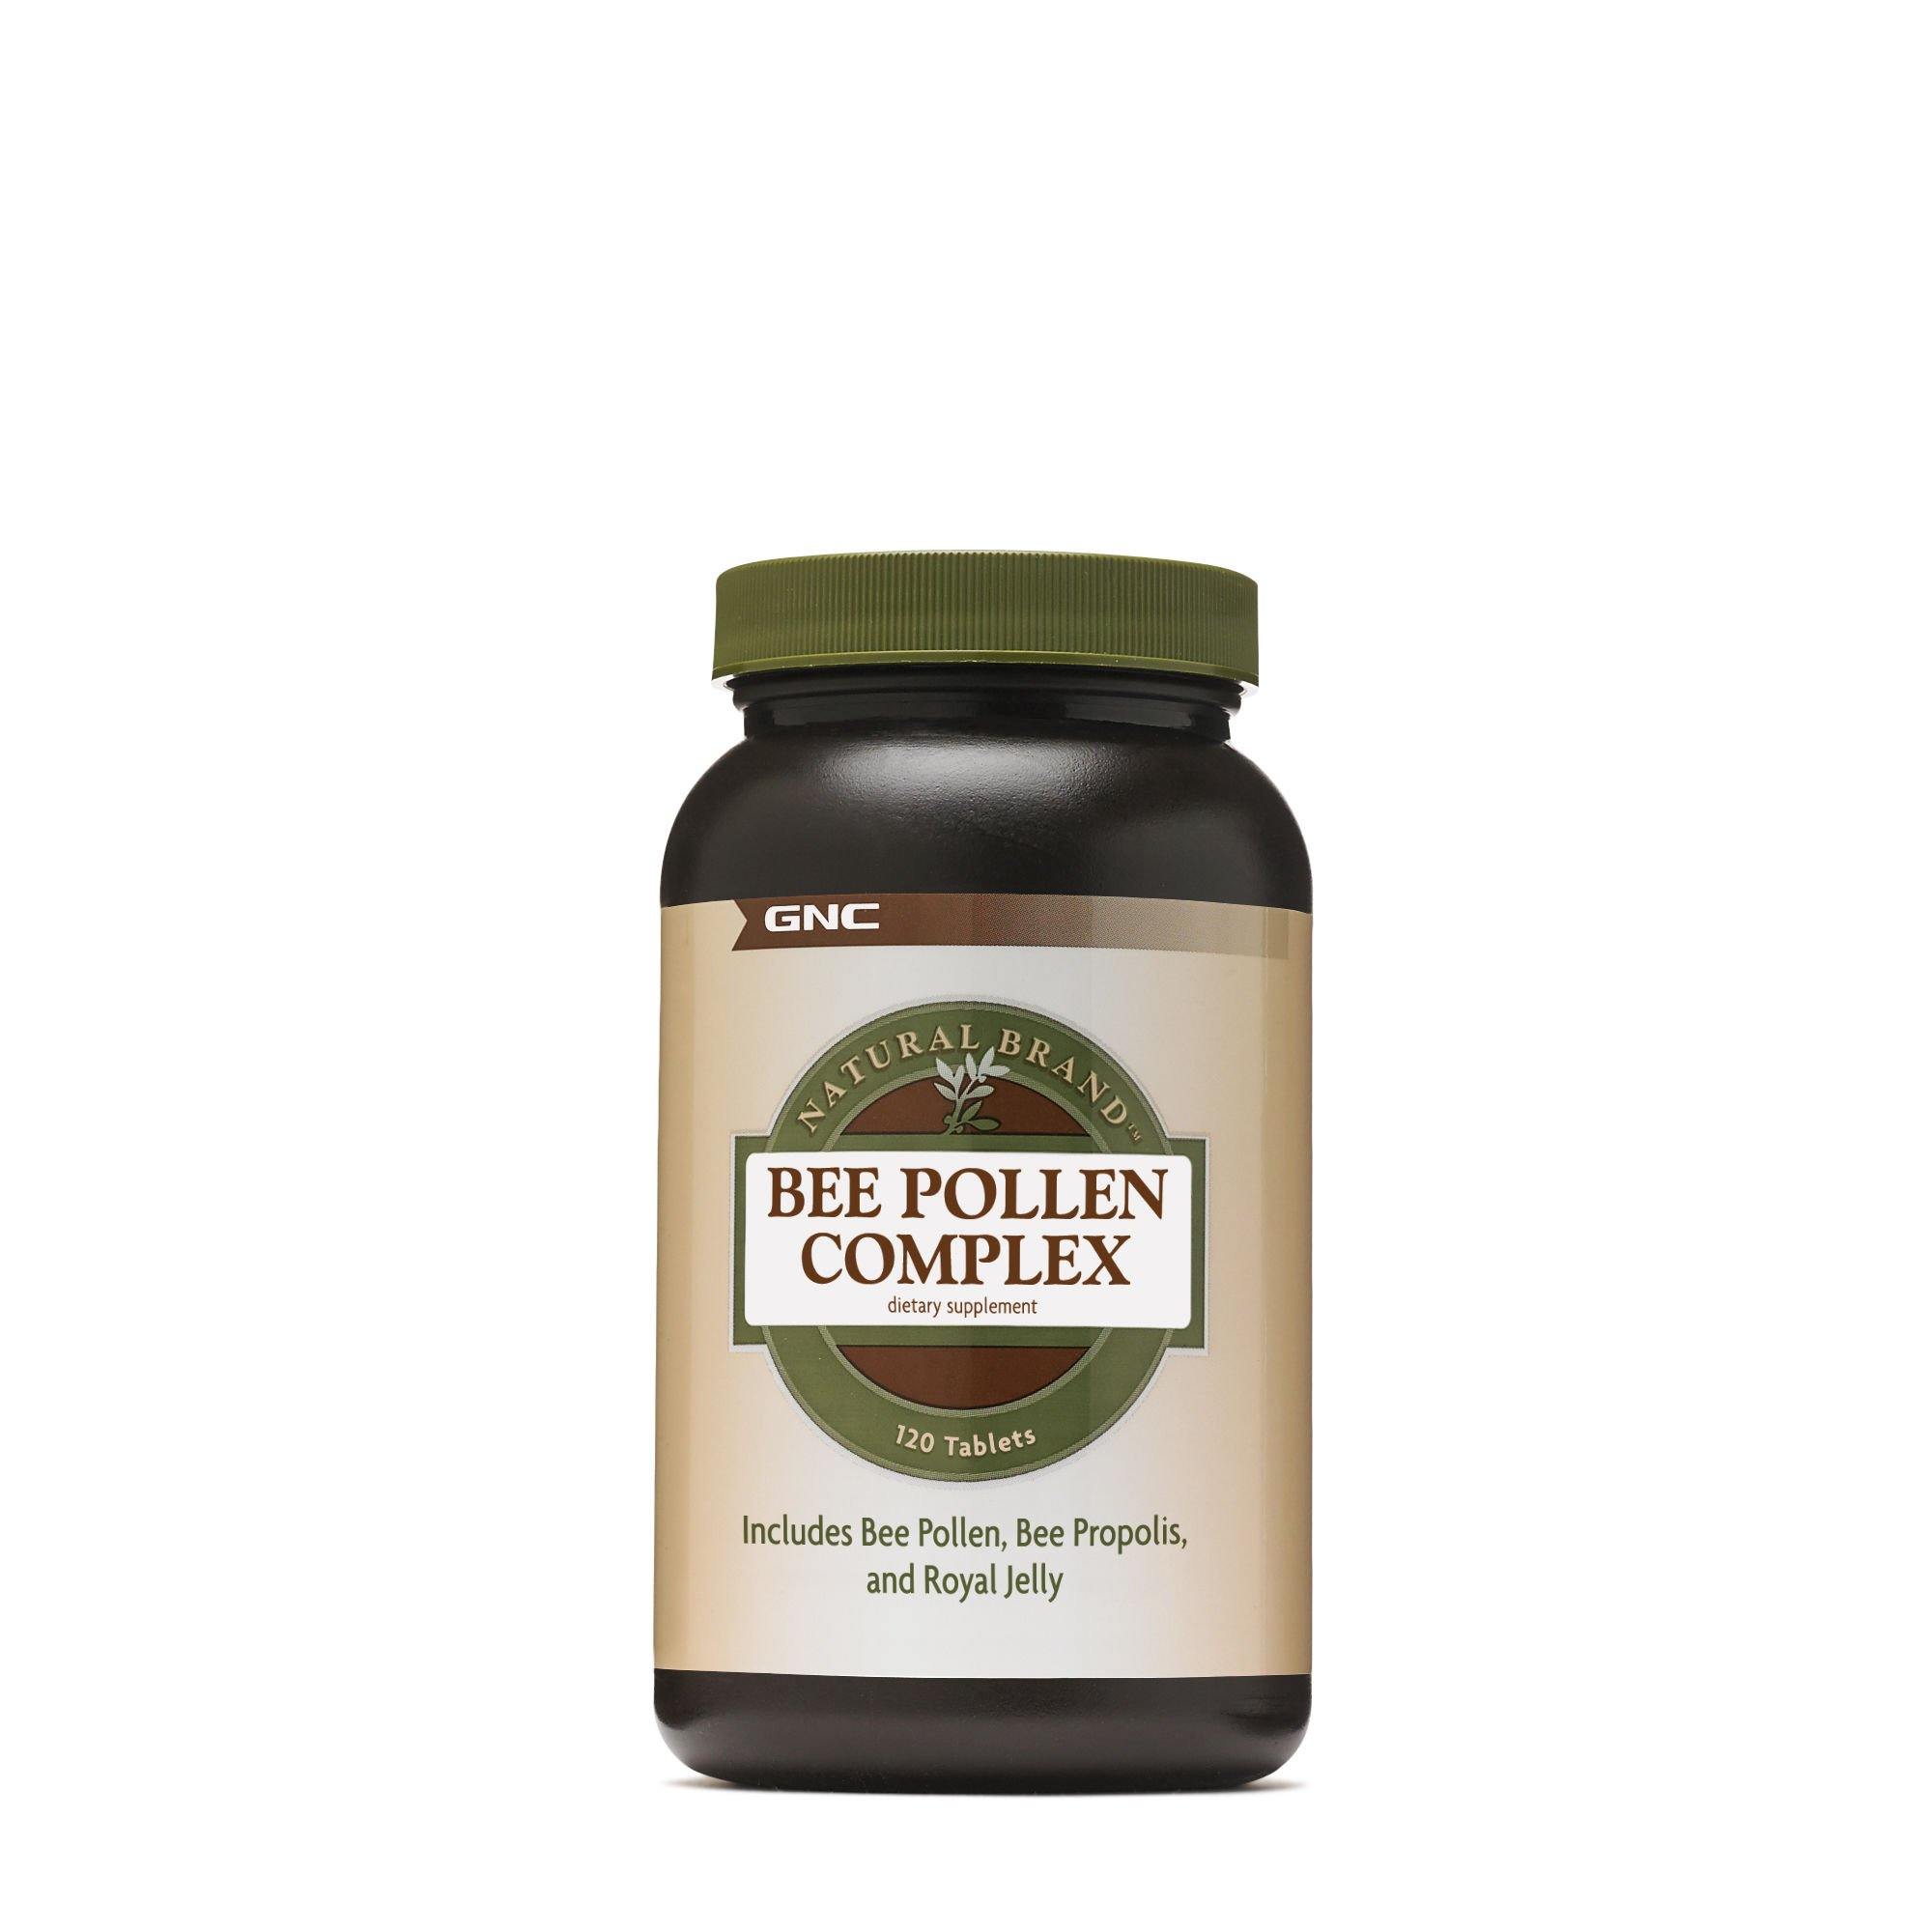 GNC Natural Brand Bee Pollen Complex, 120 Tablets